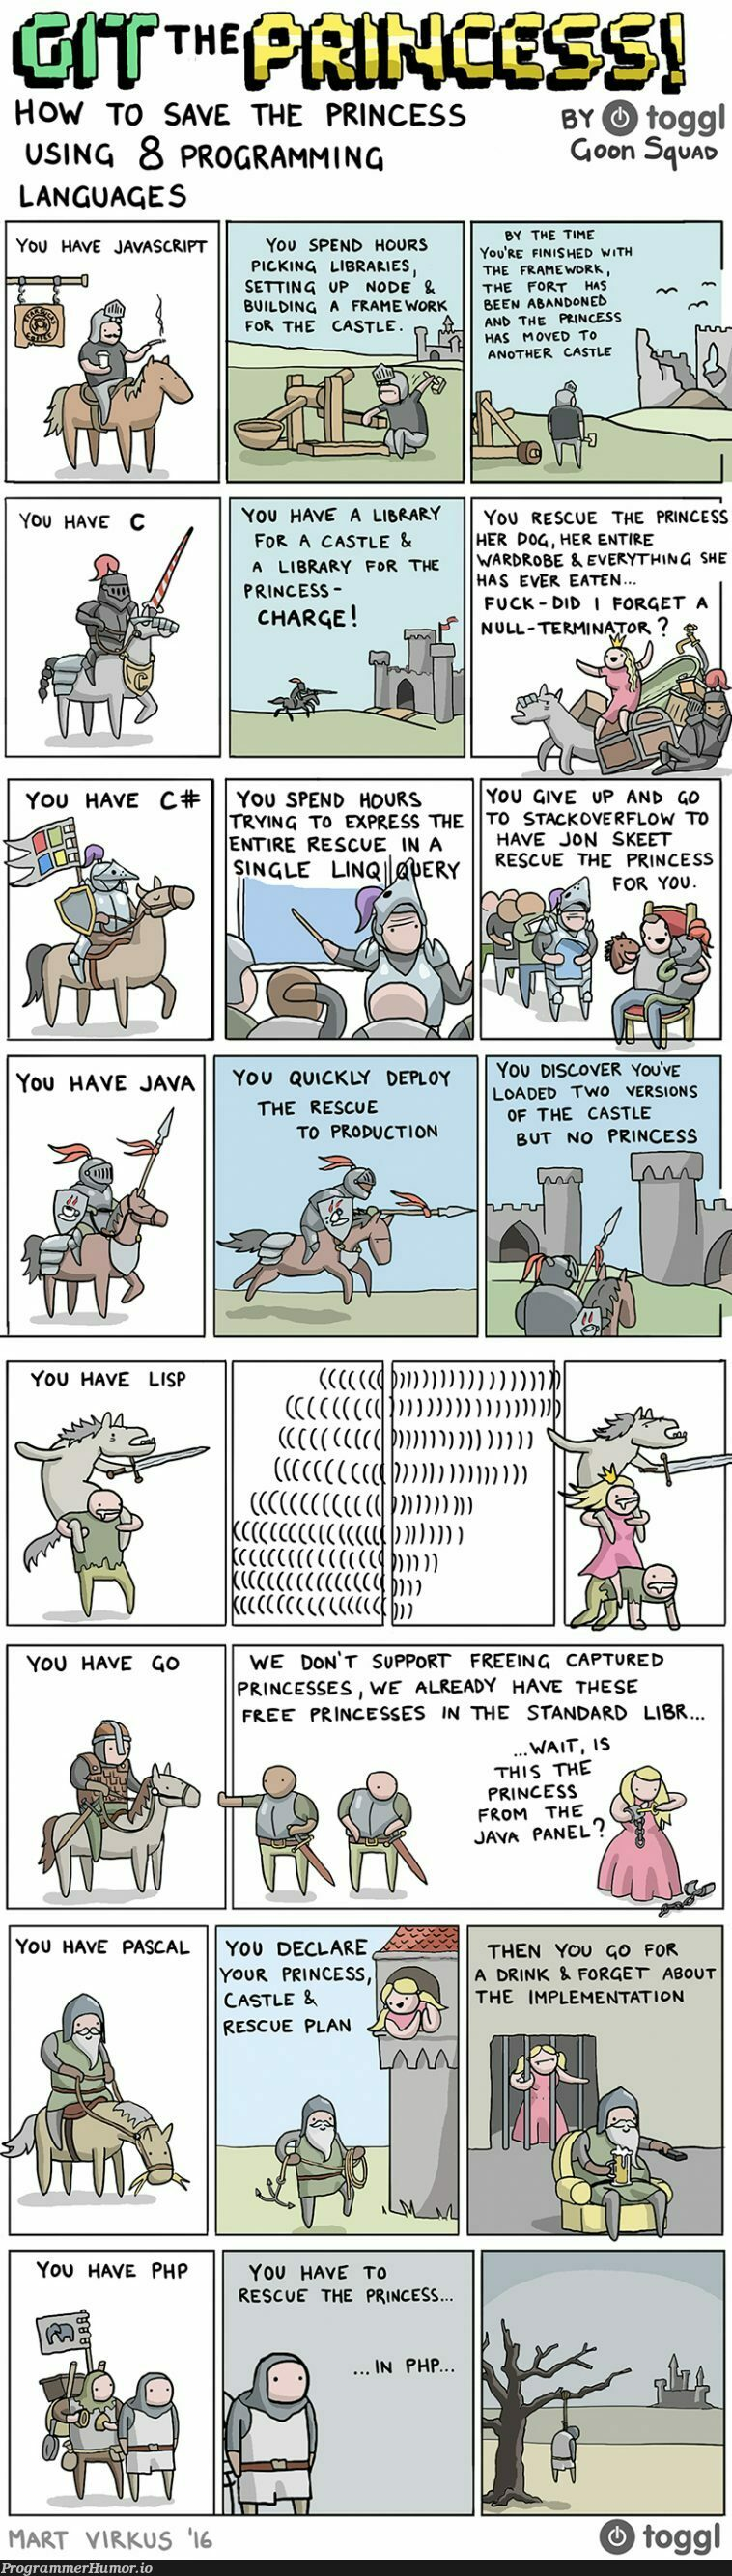 How to save the princess using programming languages | programming-memes, javascript-memes, java-memes, stackoverflow-memes, stack-memes, program-memes, try-memes, node-memes, git-memes, version-memes, express-memes, overflow-memes, production-memes, language-memes, framework-memes, product-memes, programming language-memes | ProgrammerHumor.io